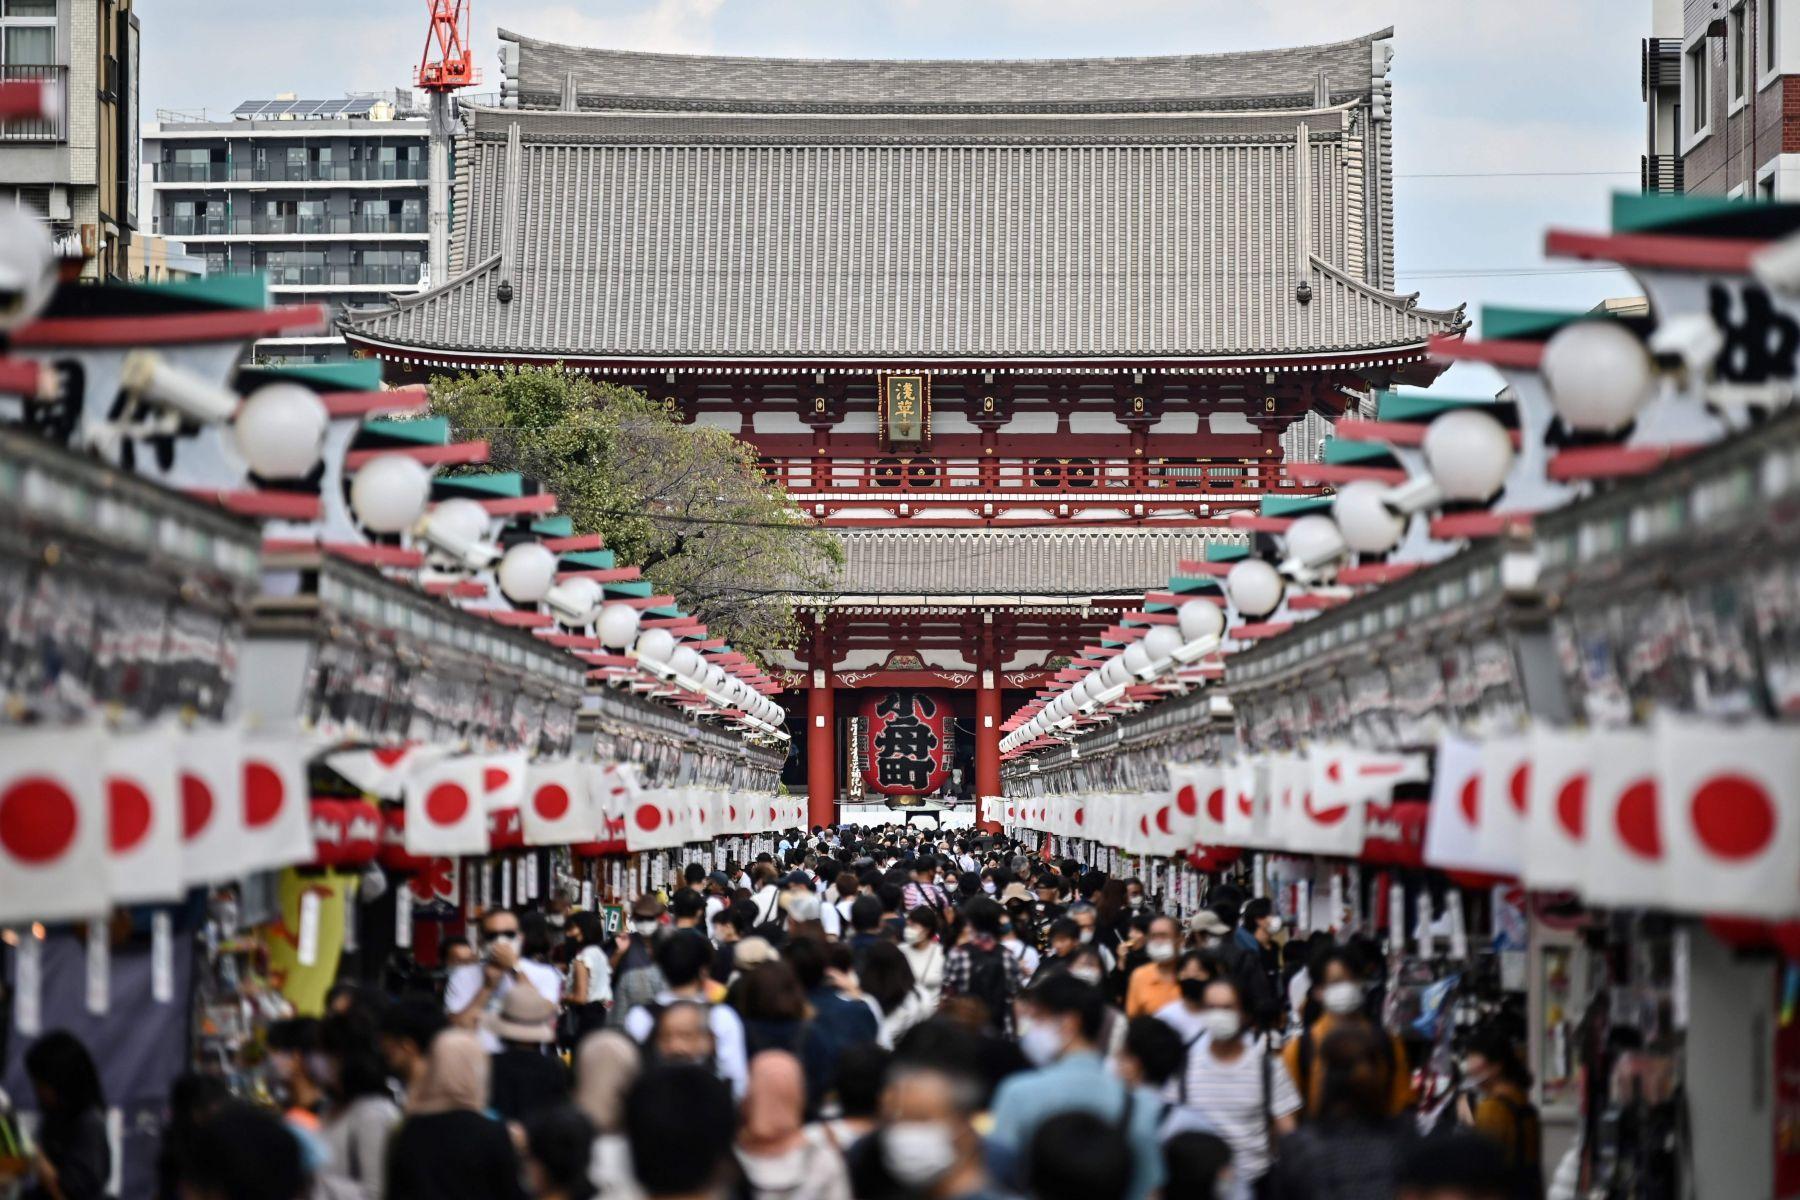 Warga Asing Dilarang Masuk Jepang 28-31 Desember